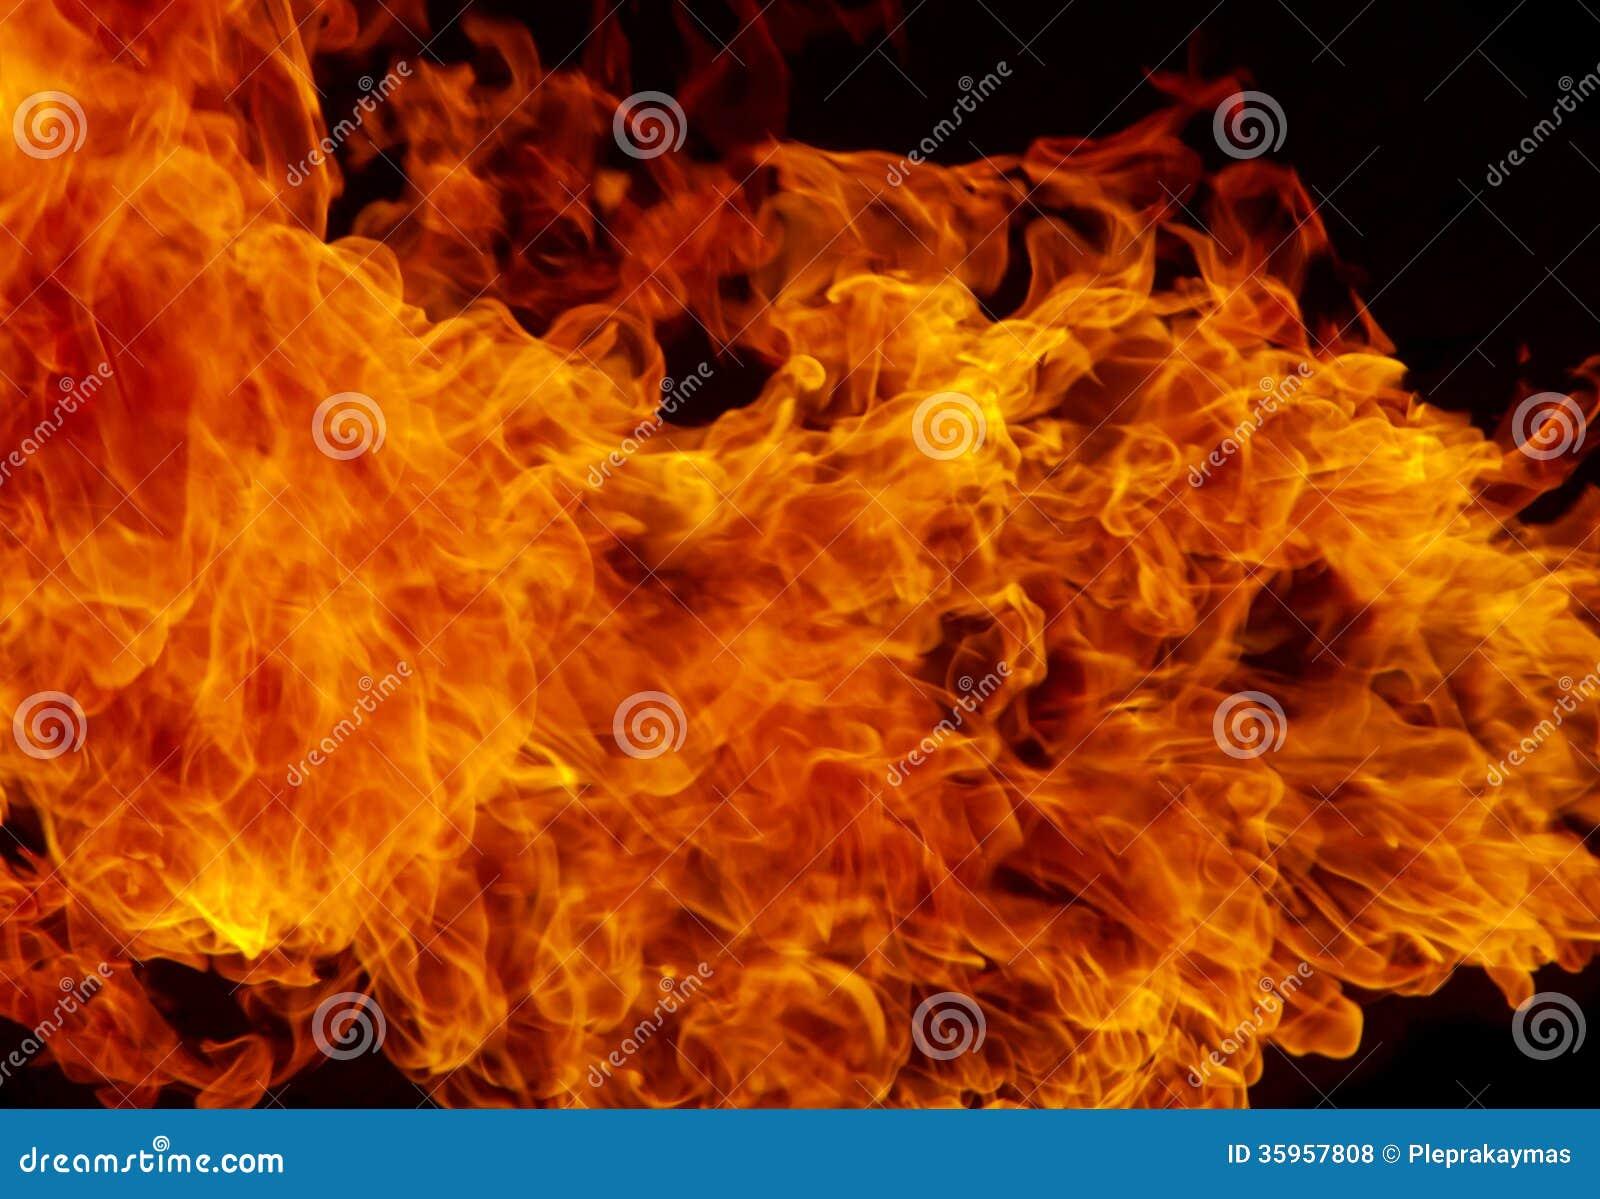 Fond De Texture De Flamme Du Feu De Flamme Photos libres de droits - Image: 35957808